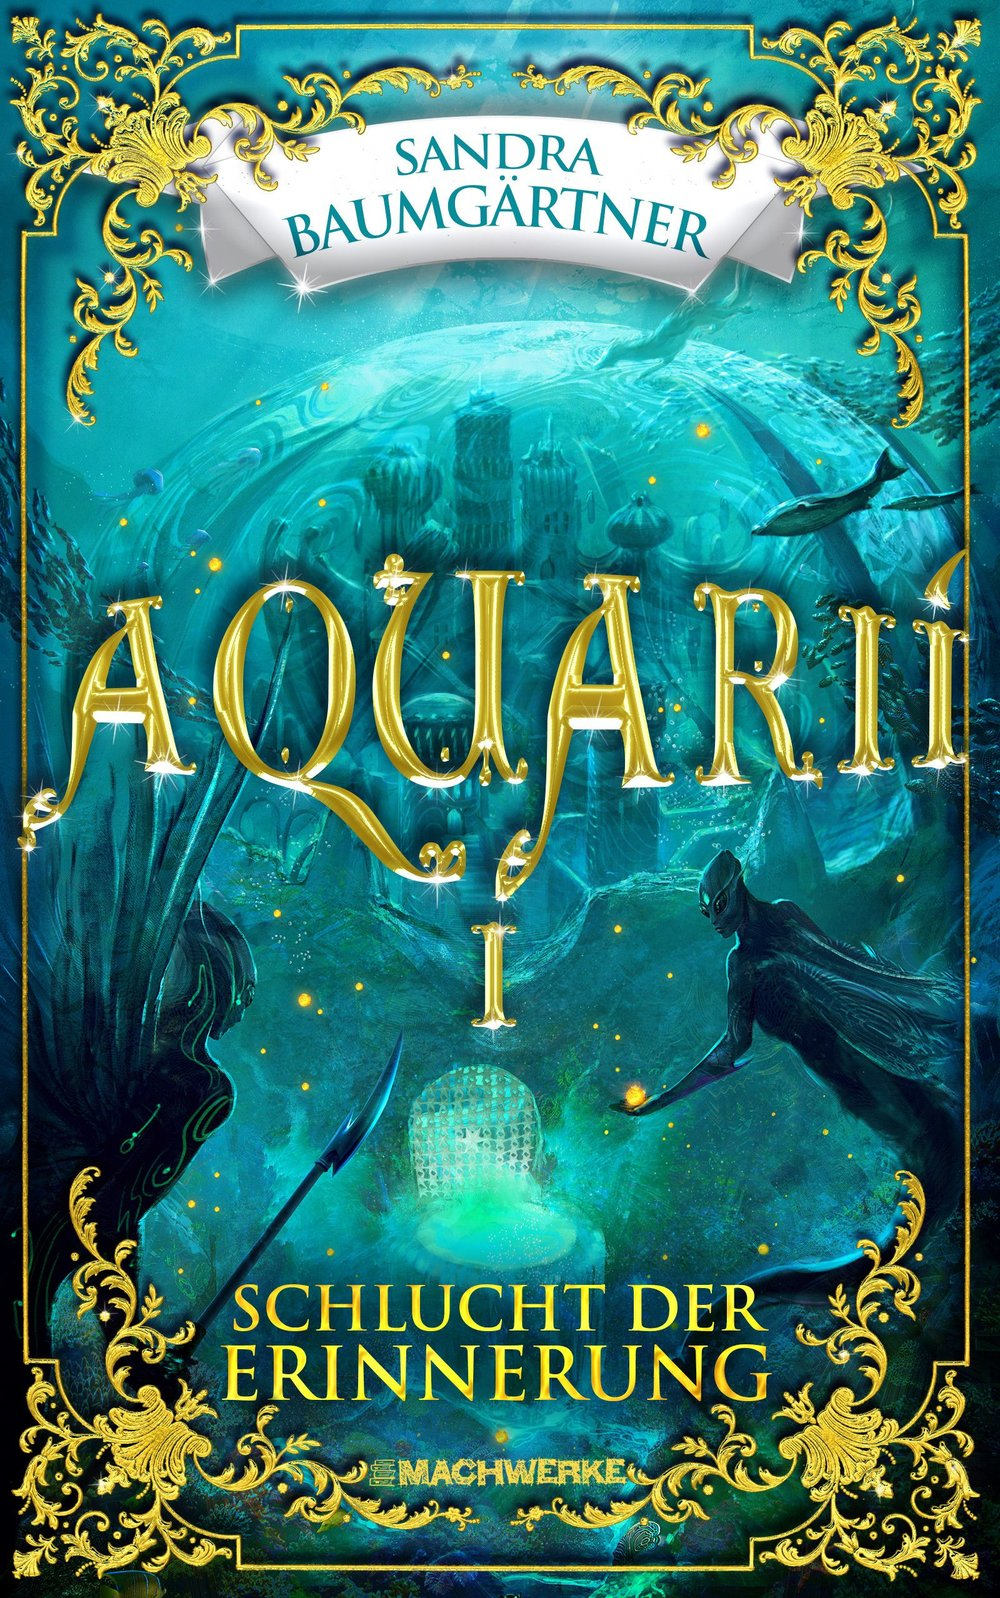 Aquarii-Schlucht-der-Erinnerung_Sandra-Baumgaertner.jpg